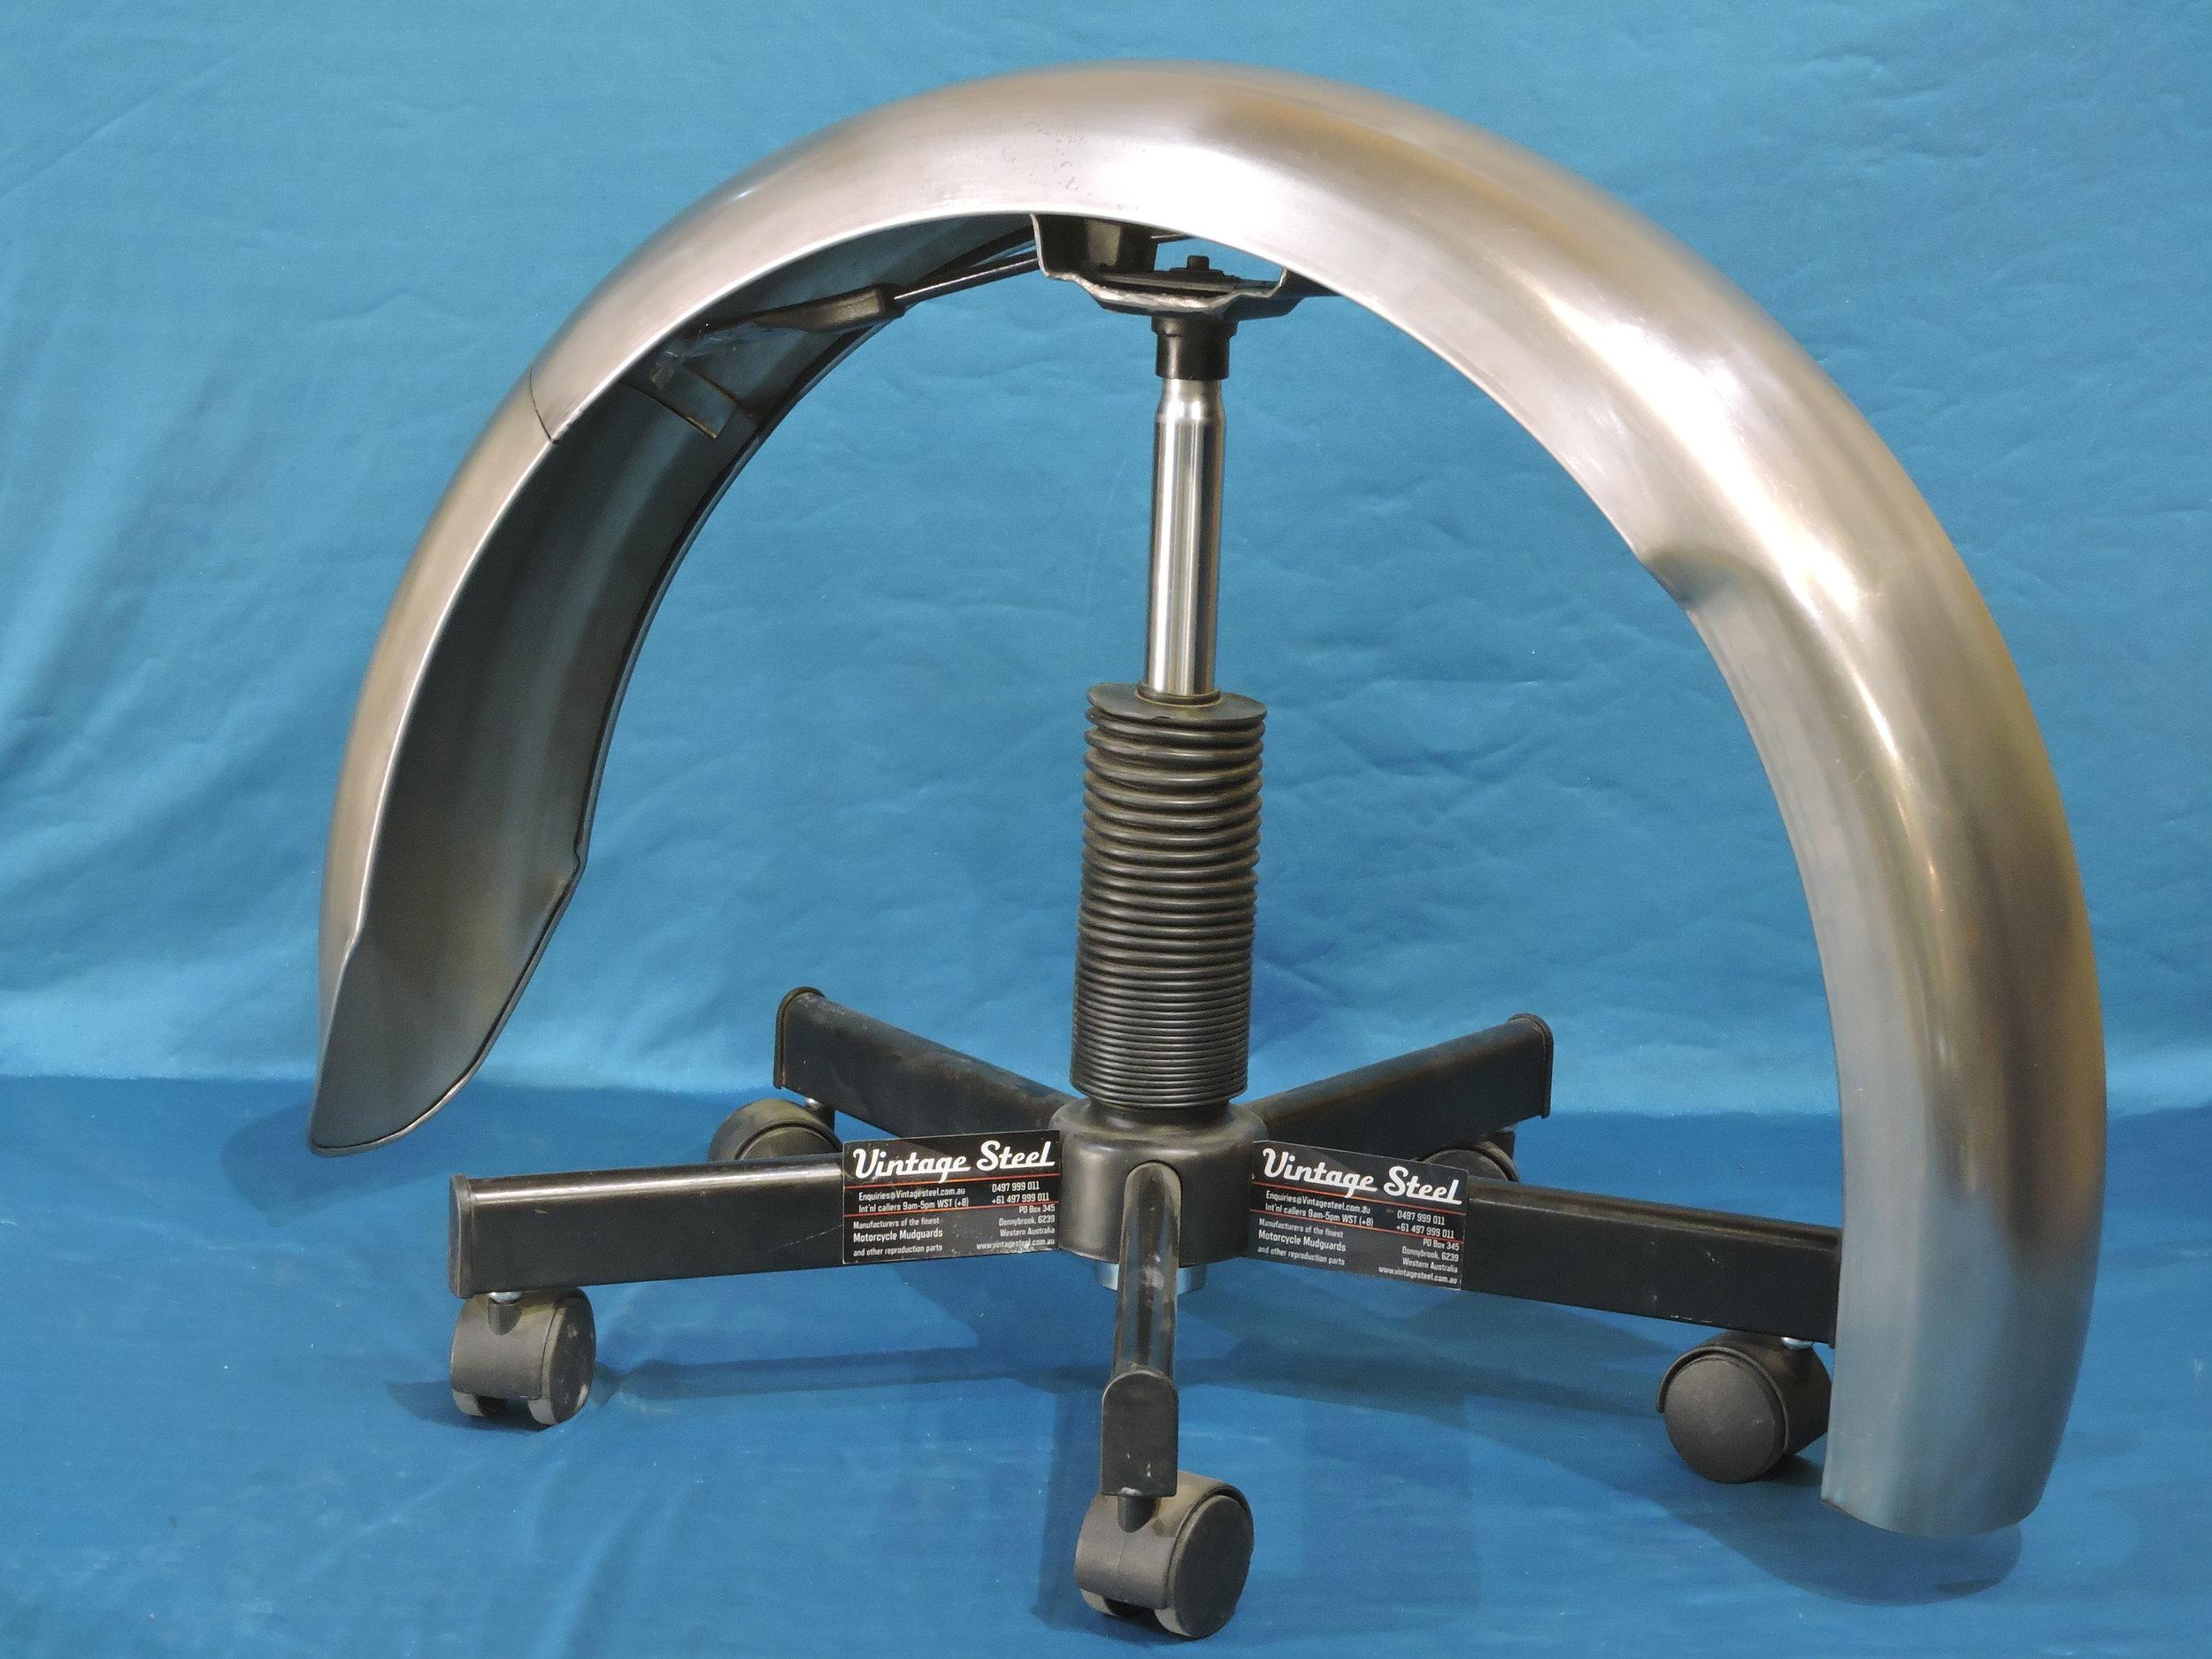 42 NORTON Inter plunger REAR 1948-52 (3).JPG